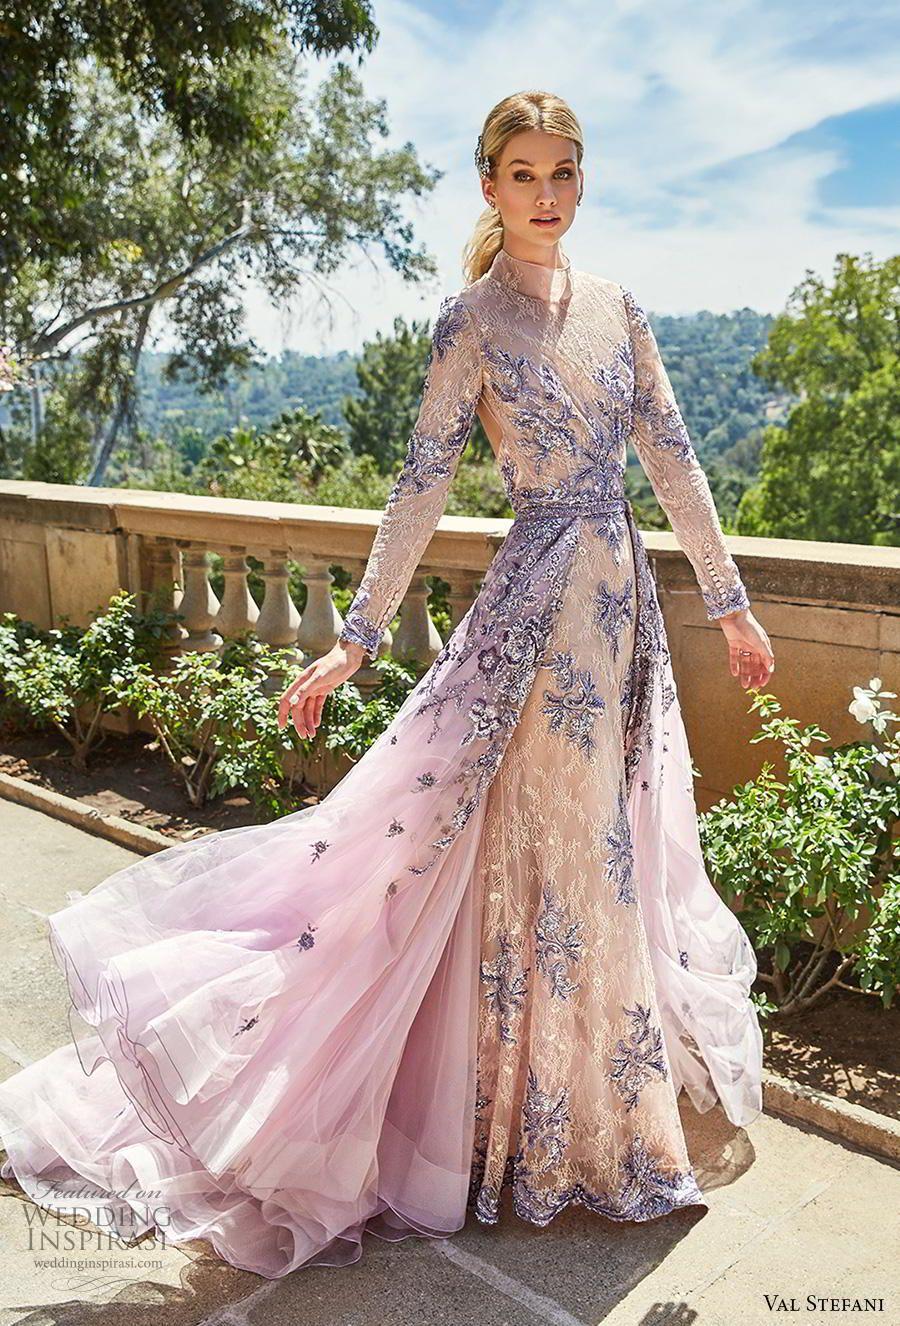 Val Stefani Spring 2019 Wedding Dresses Wedding Inspirasi Spring Wedding Dress Purple Wedding Dress Modcloth Wedding Dress [ 1326 x 900 Pixel ]